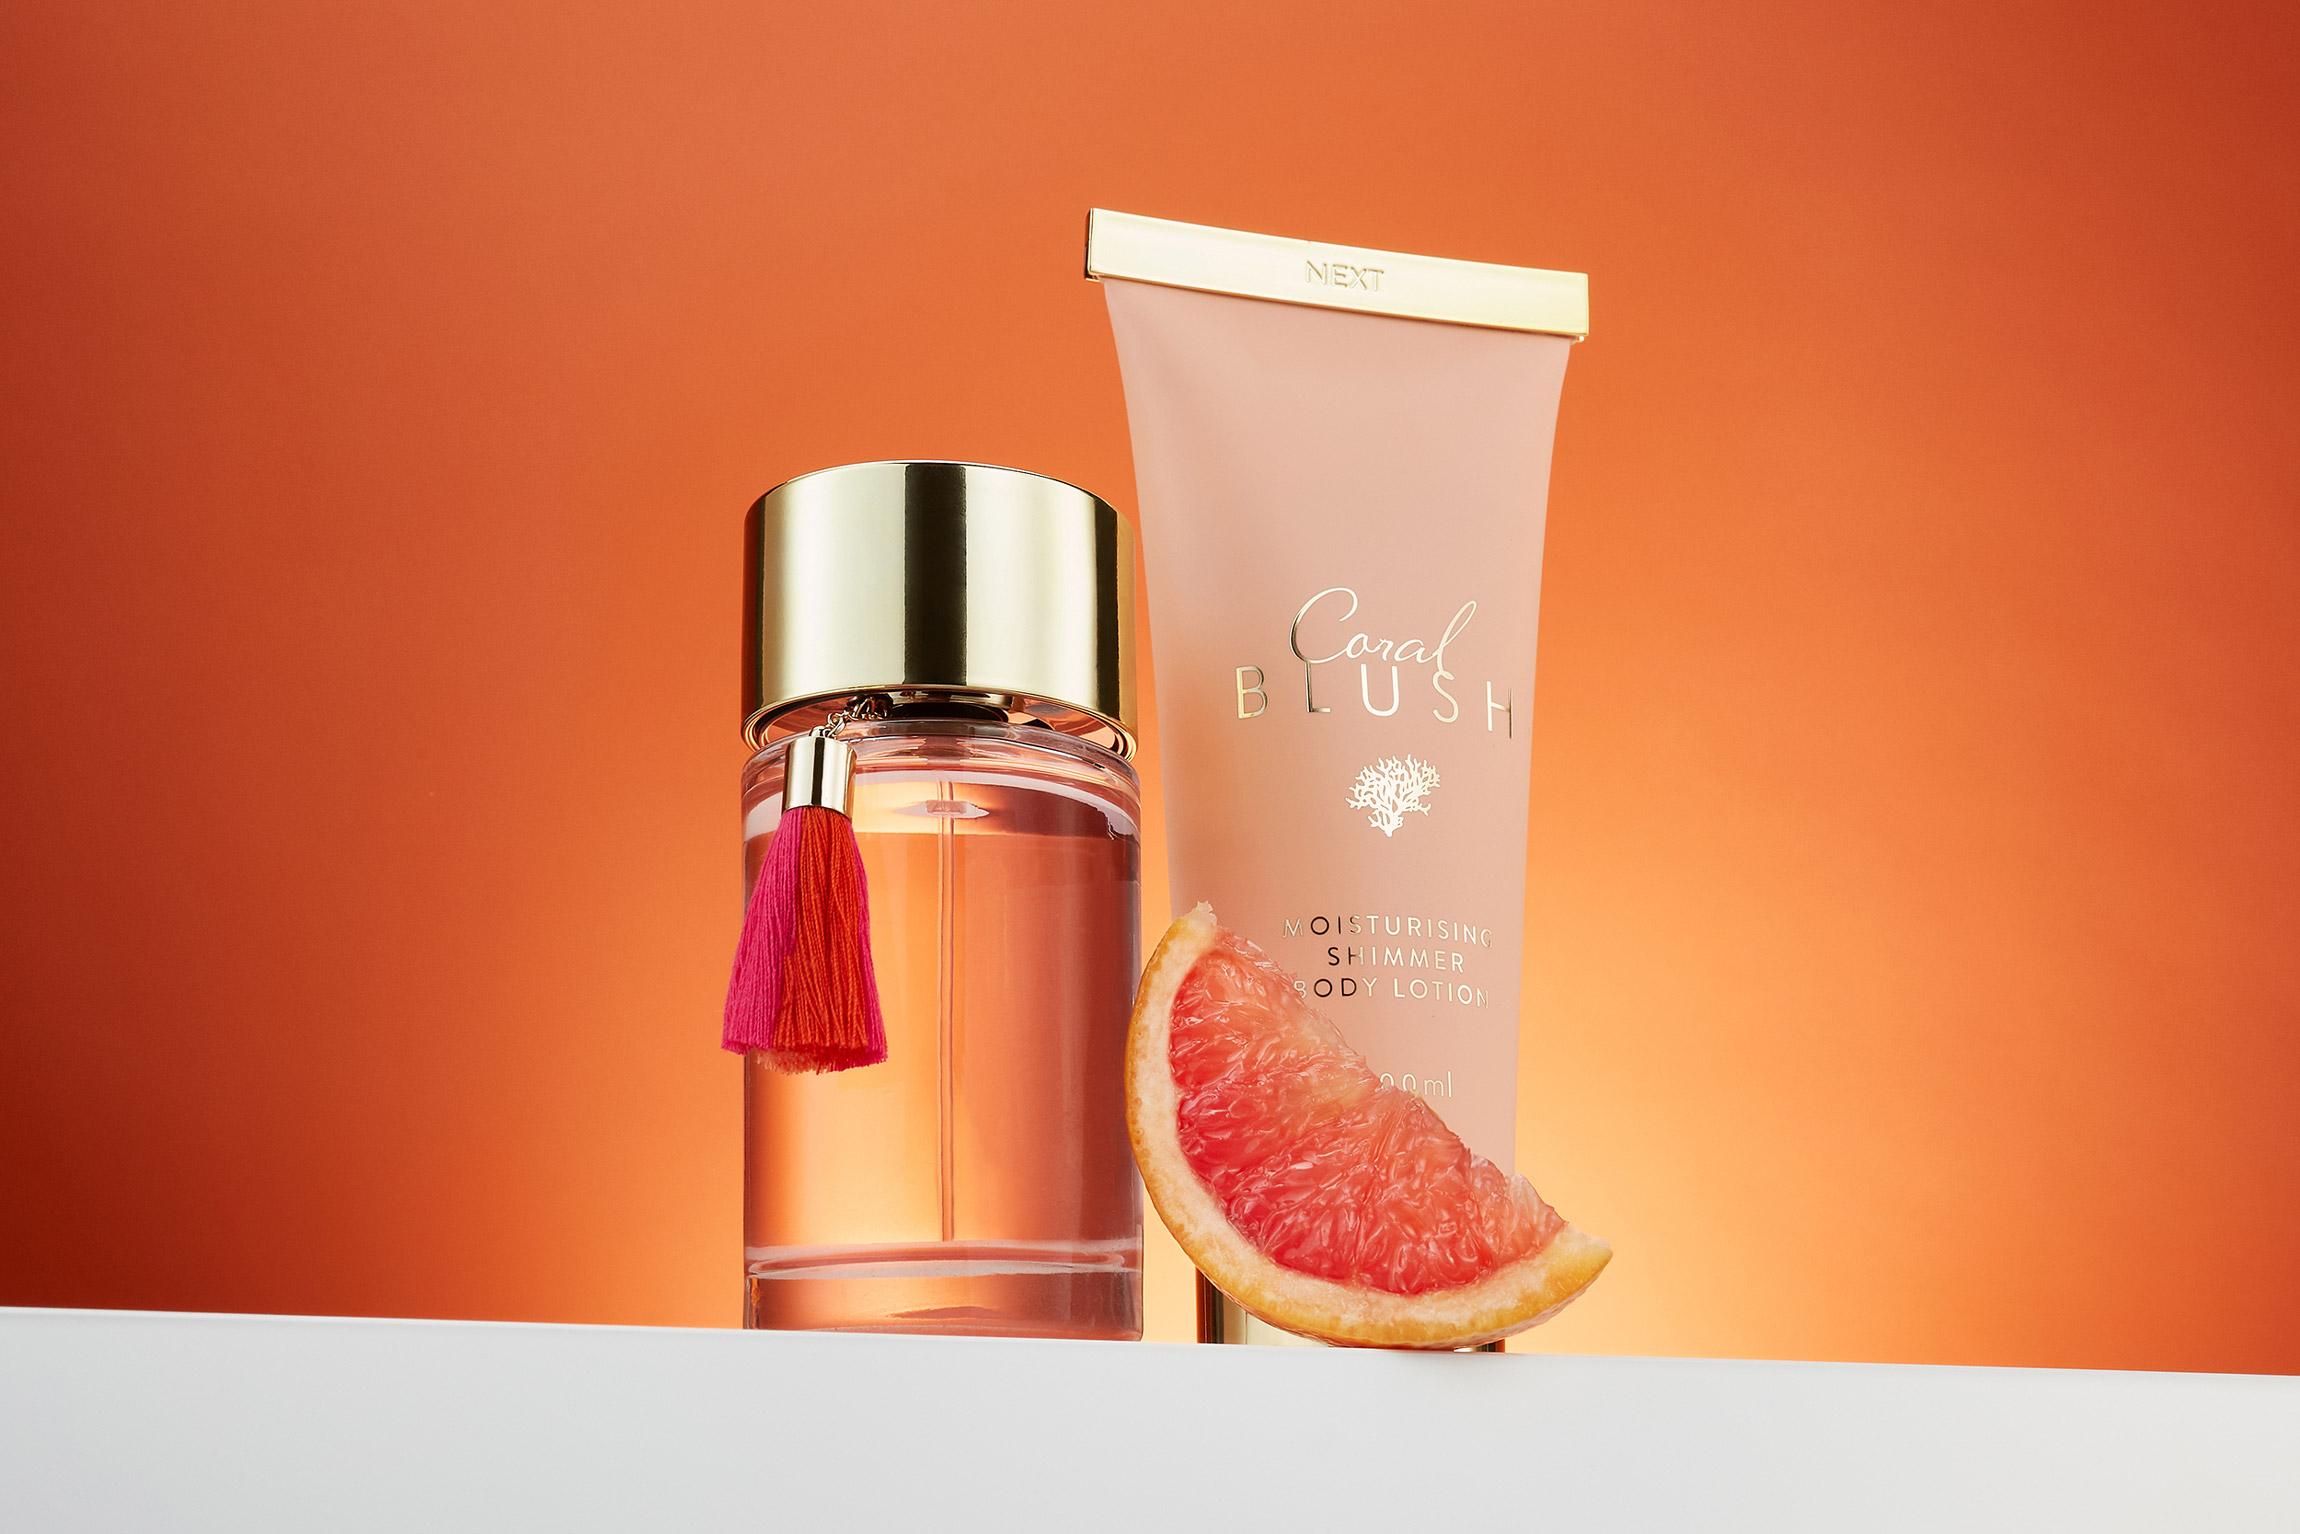 next-summer-fregrance-perfume-photography-product-photographer-ben-appleby.jpg